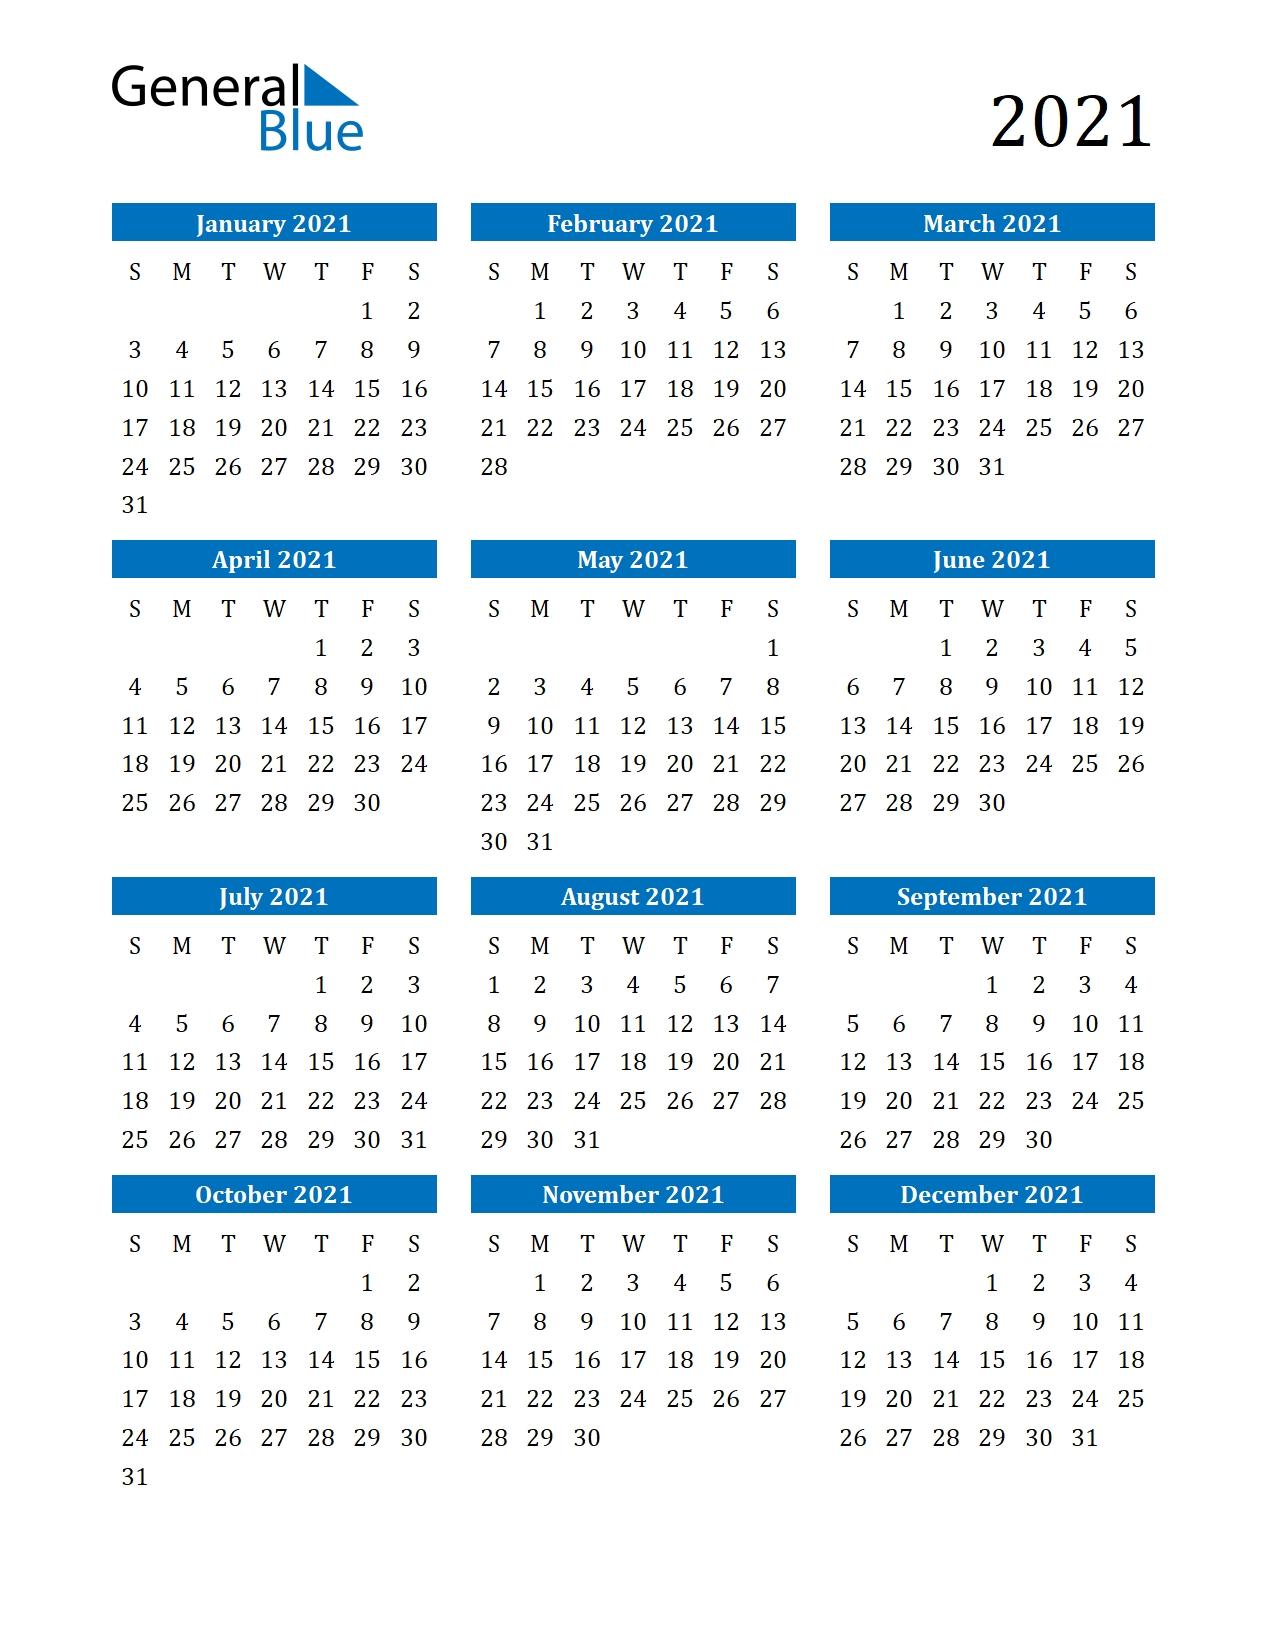 Take August December 2021